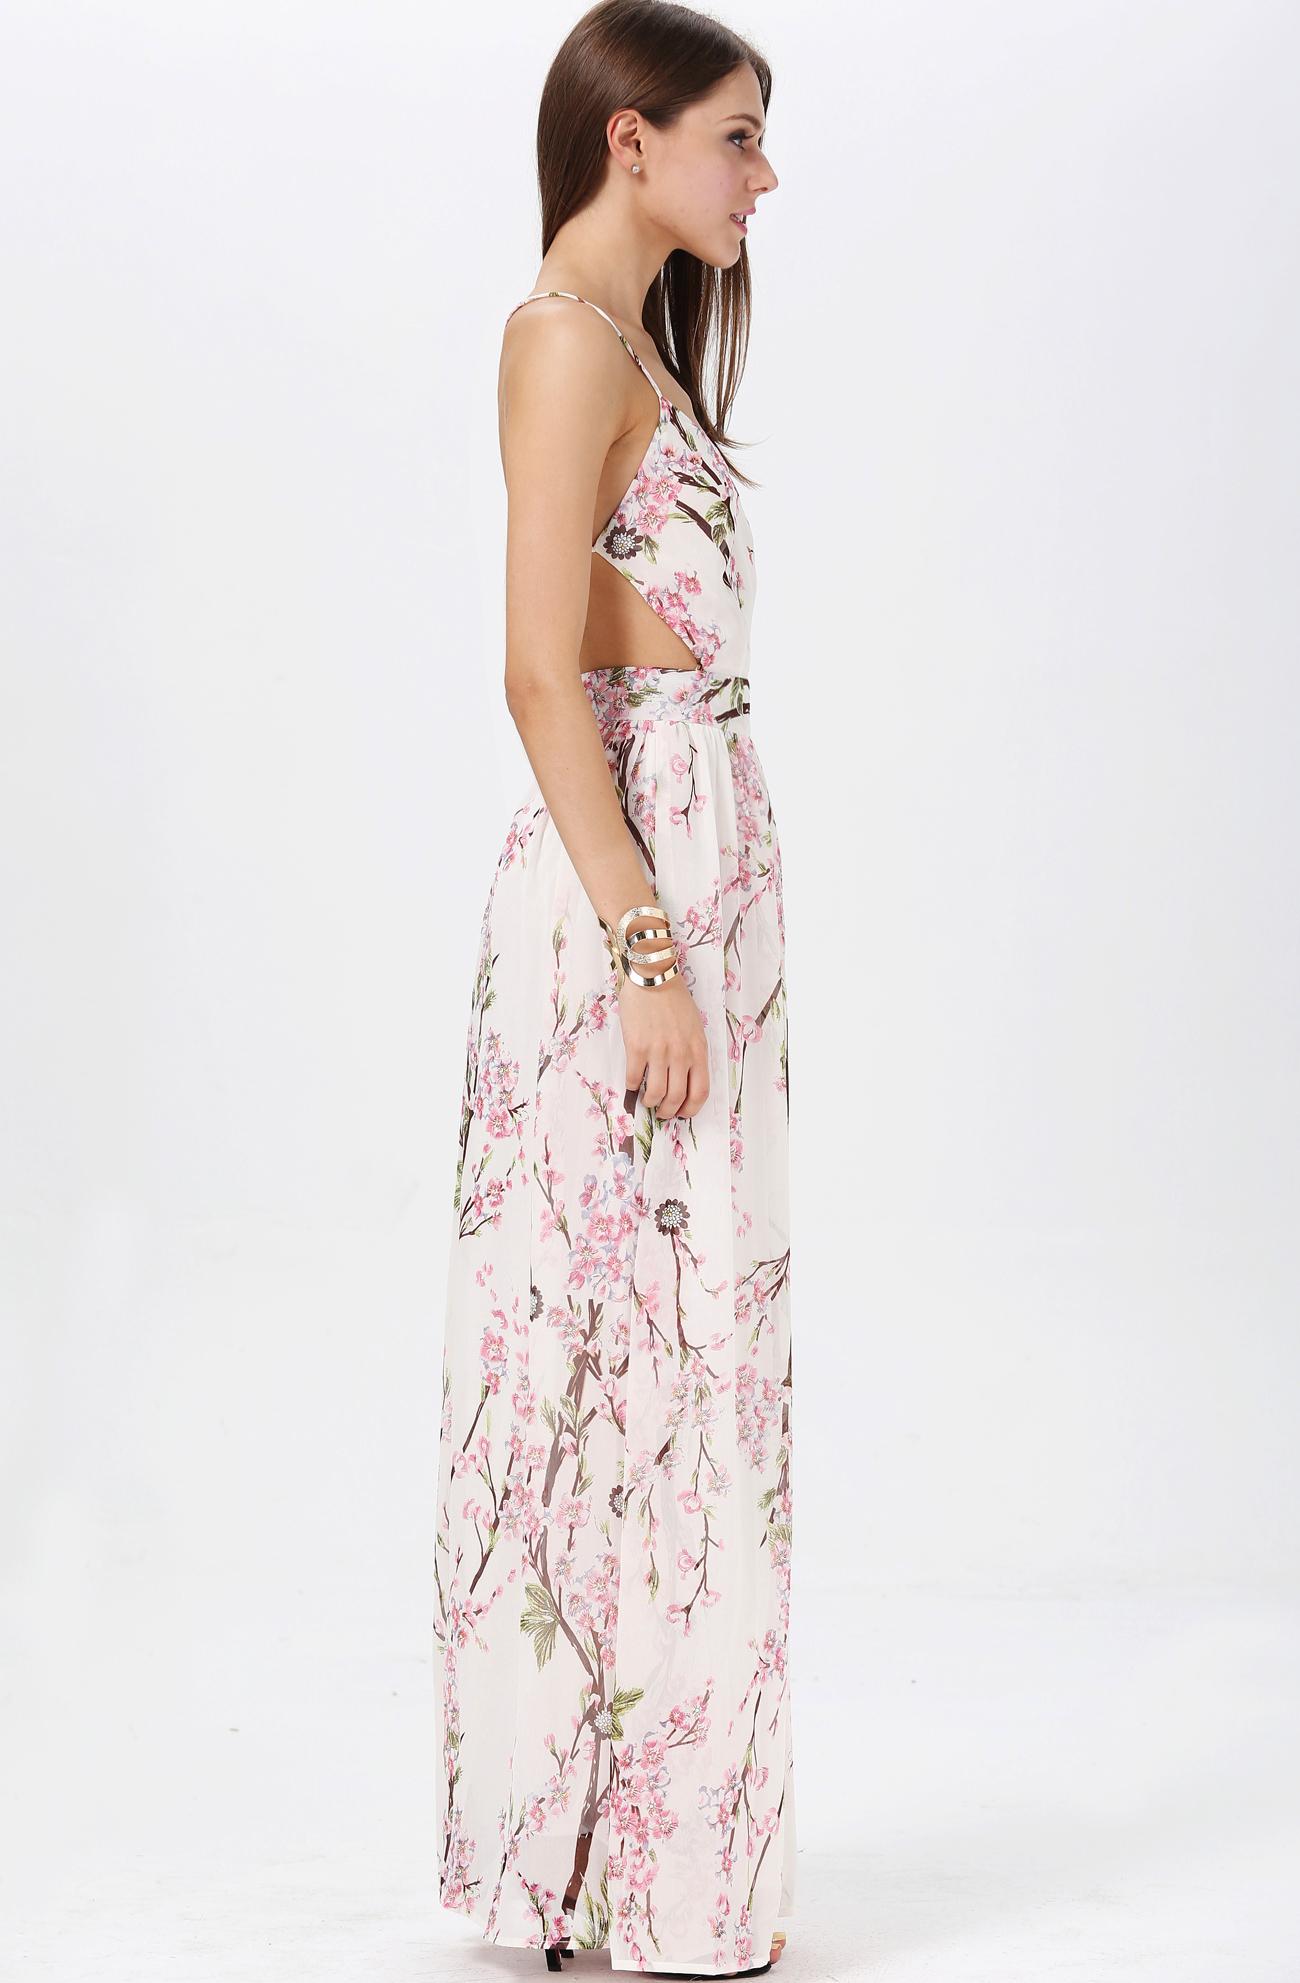 Apricot Florals V-neck Spaghetti Straps Backless Maxi Dress - Sheinside.com